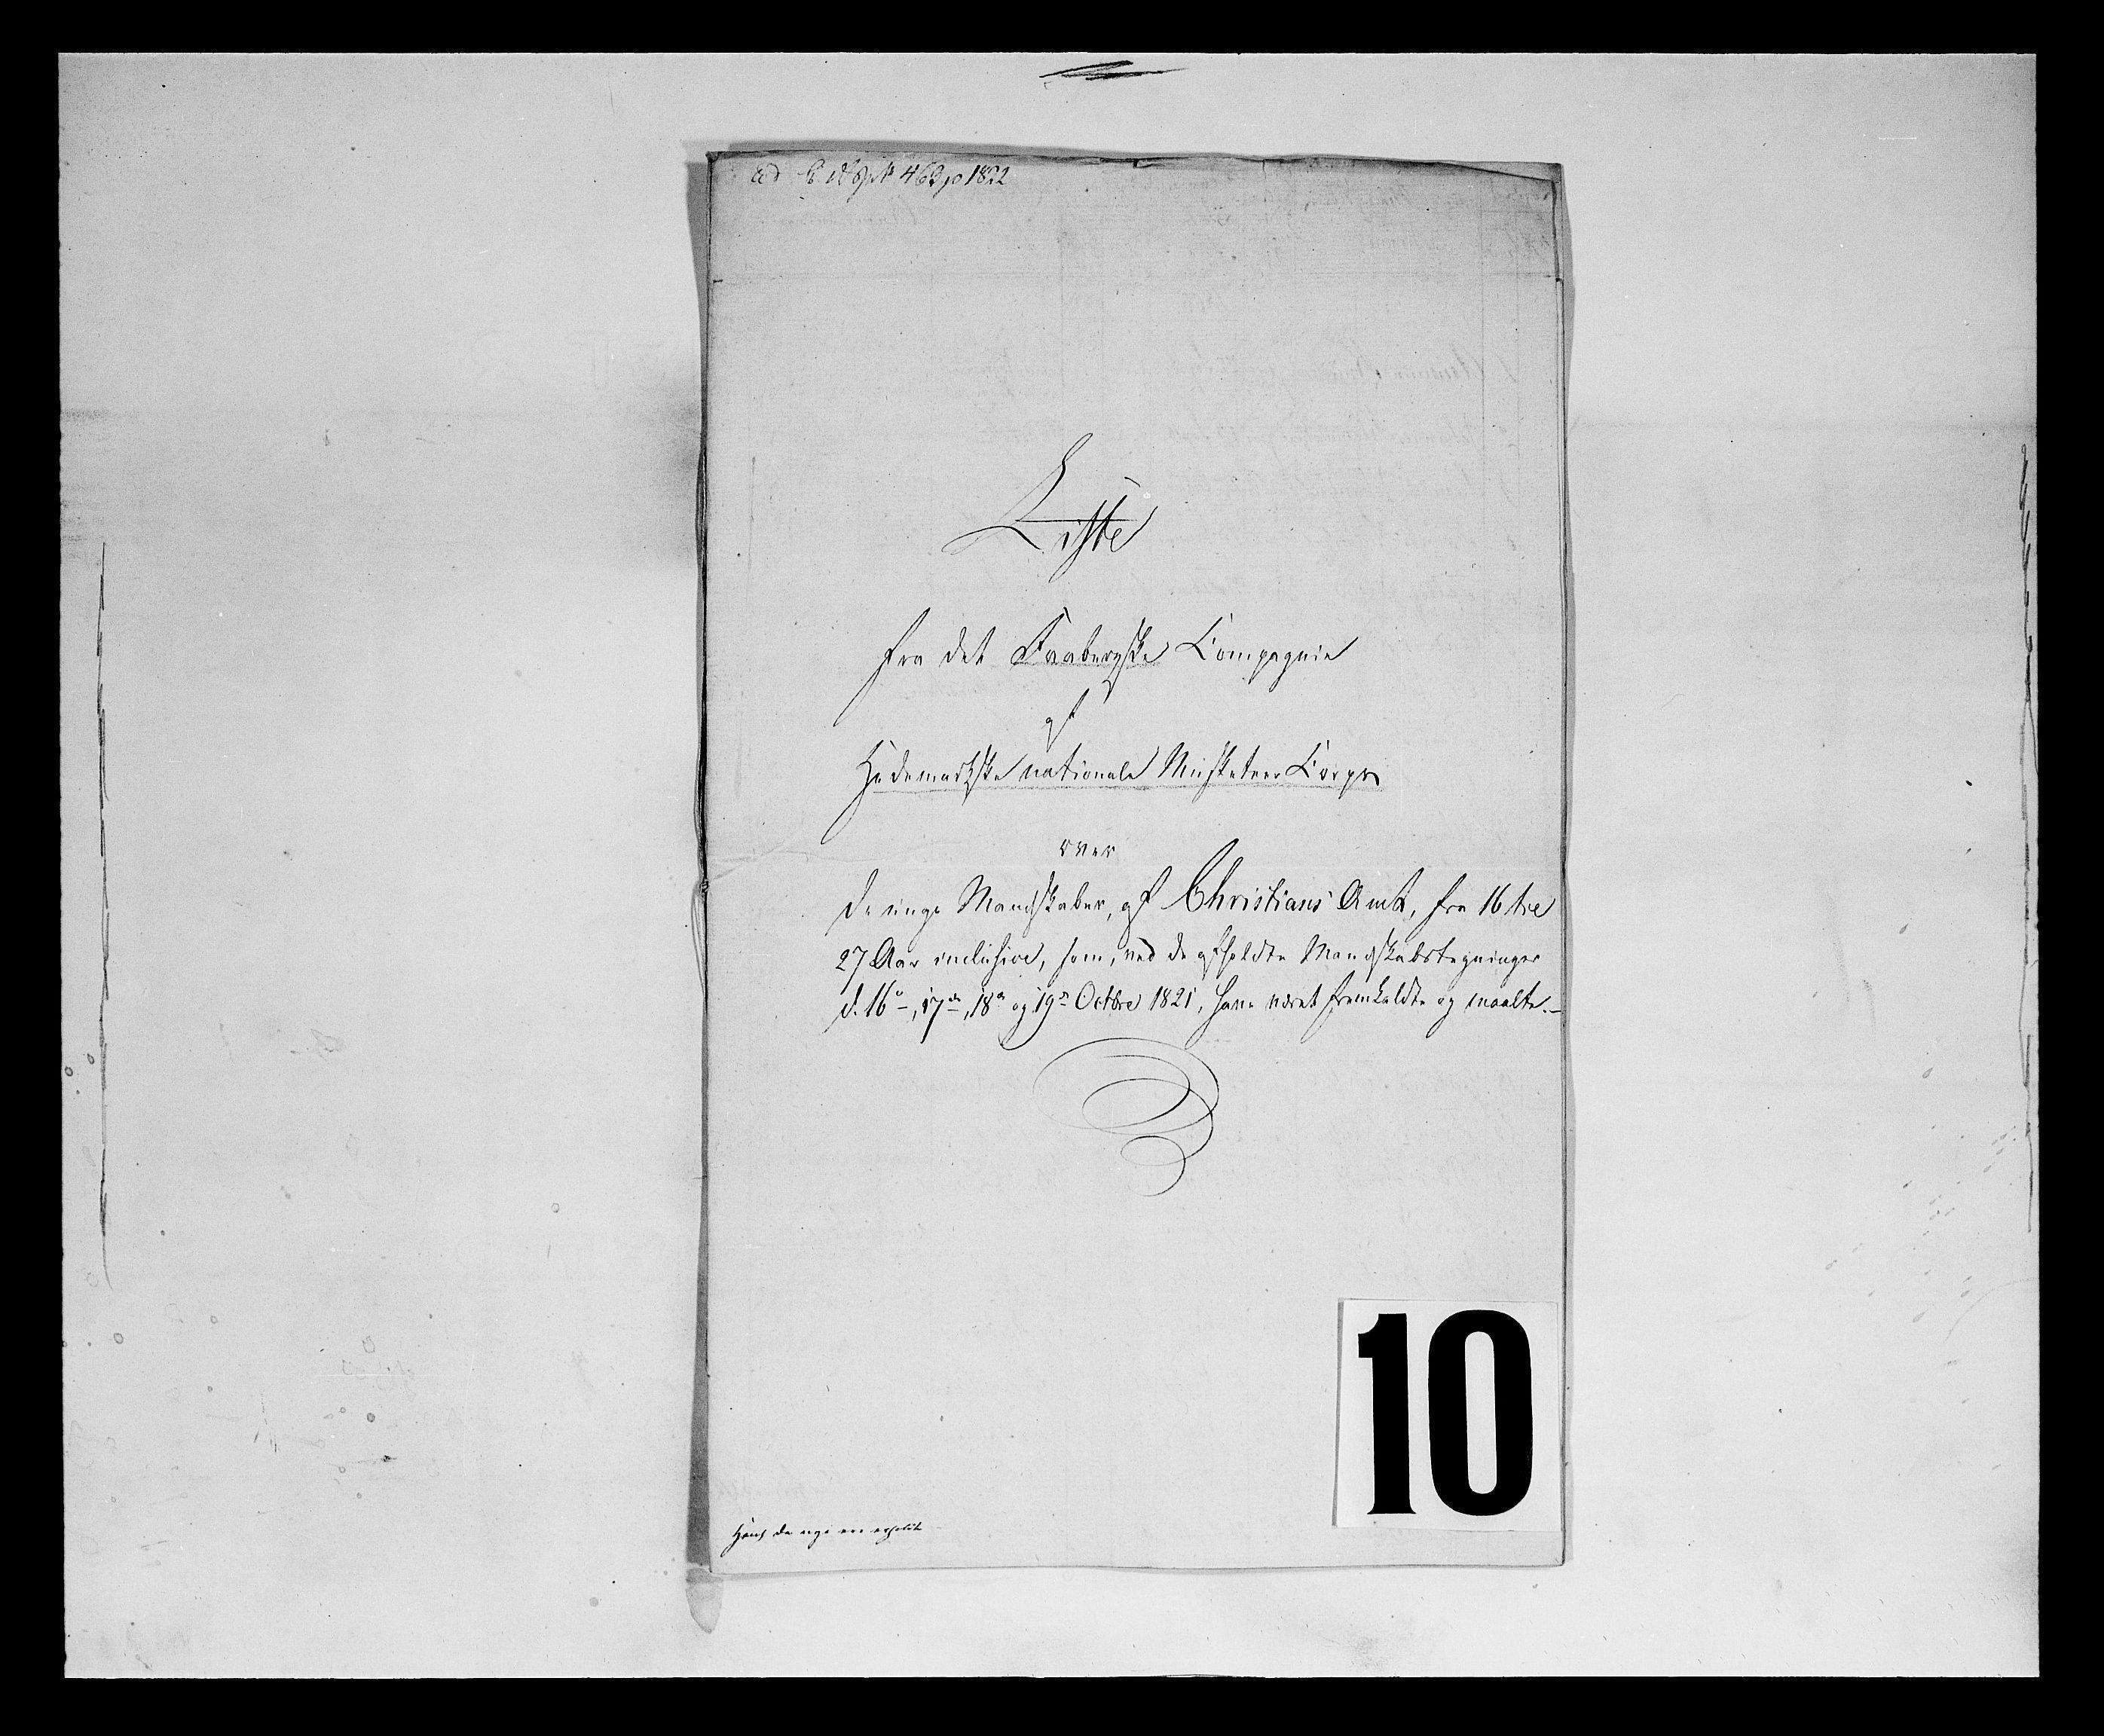 SAH, Fylkesmannen i Oppland, K/Ka/L1156: Hedemarken nasjonale musketérkorps, 1818-1860, s. 2